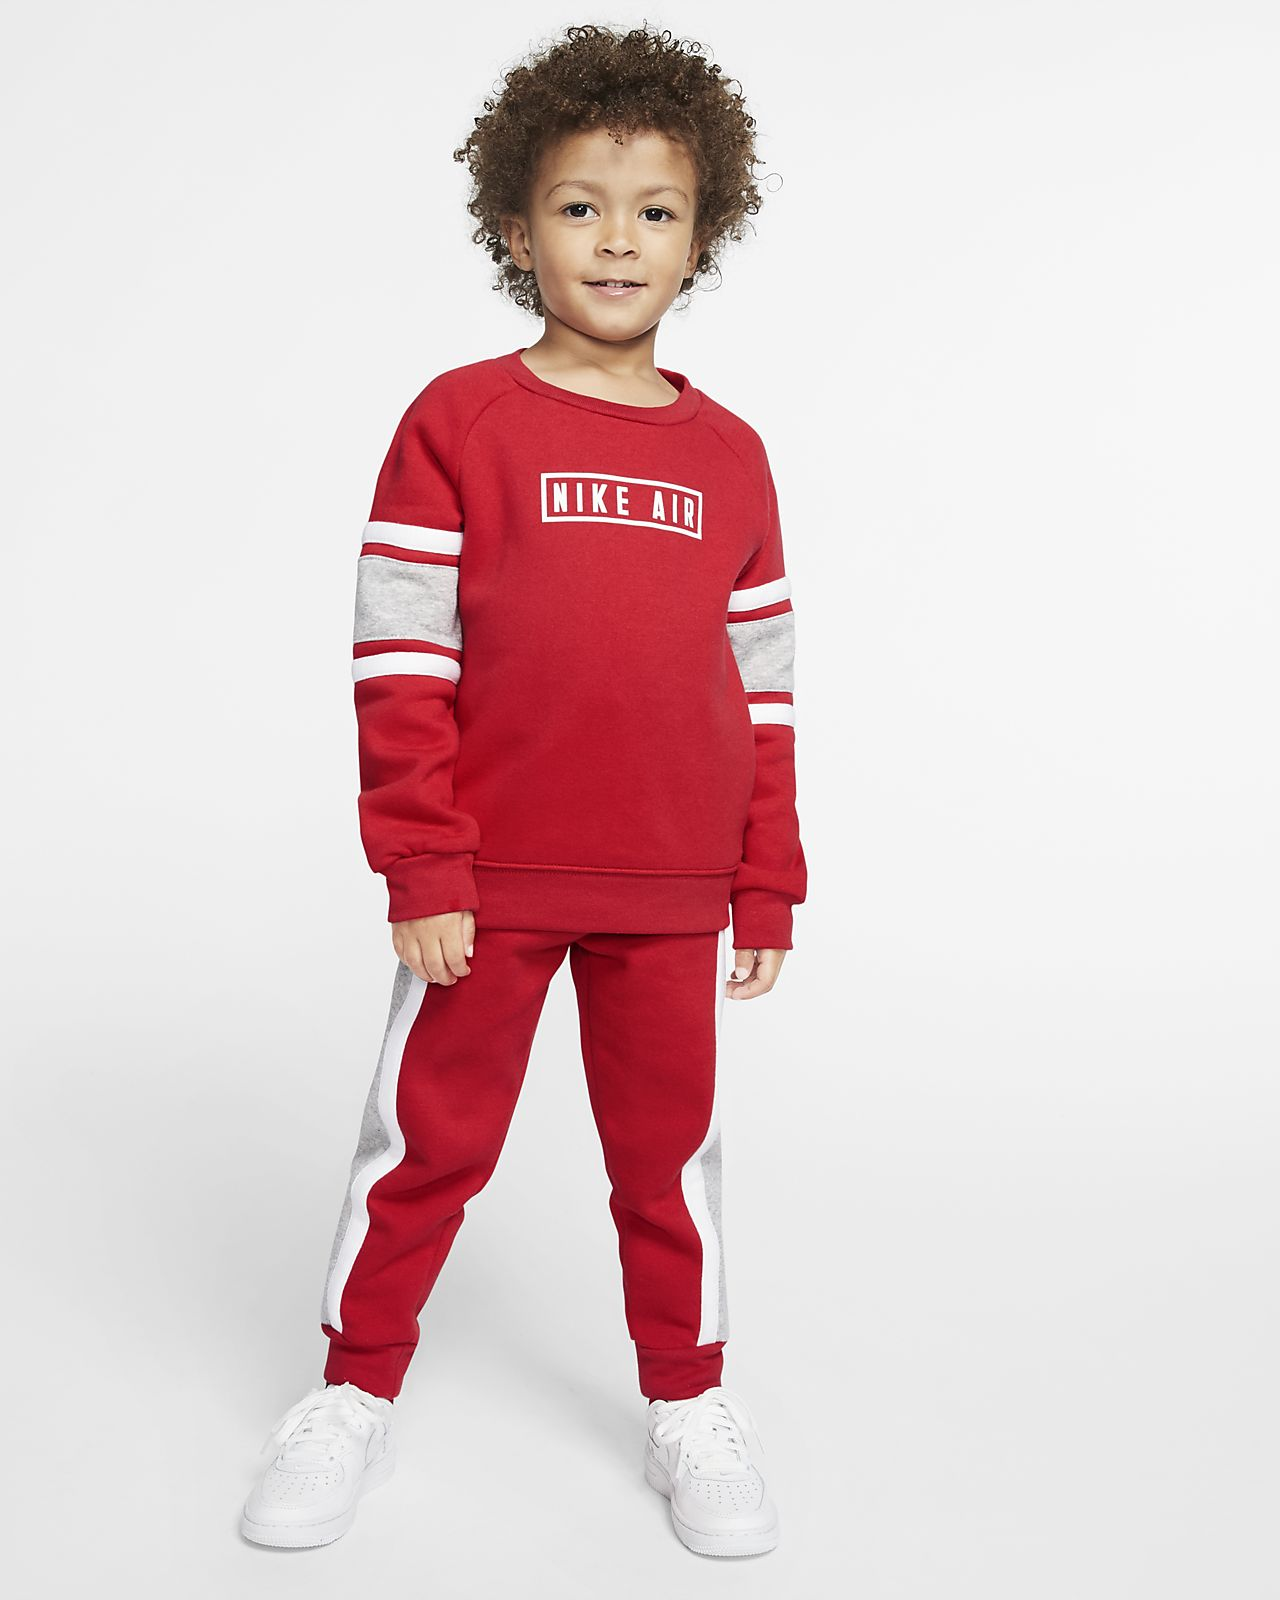 Nike Air Toddler Crew and Joggers 2-Piece Set